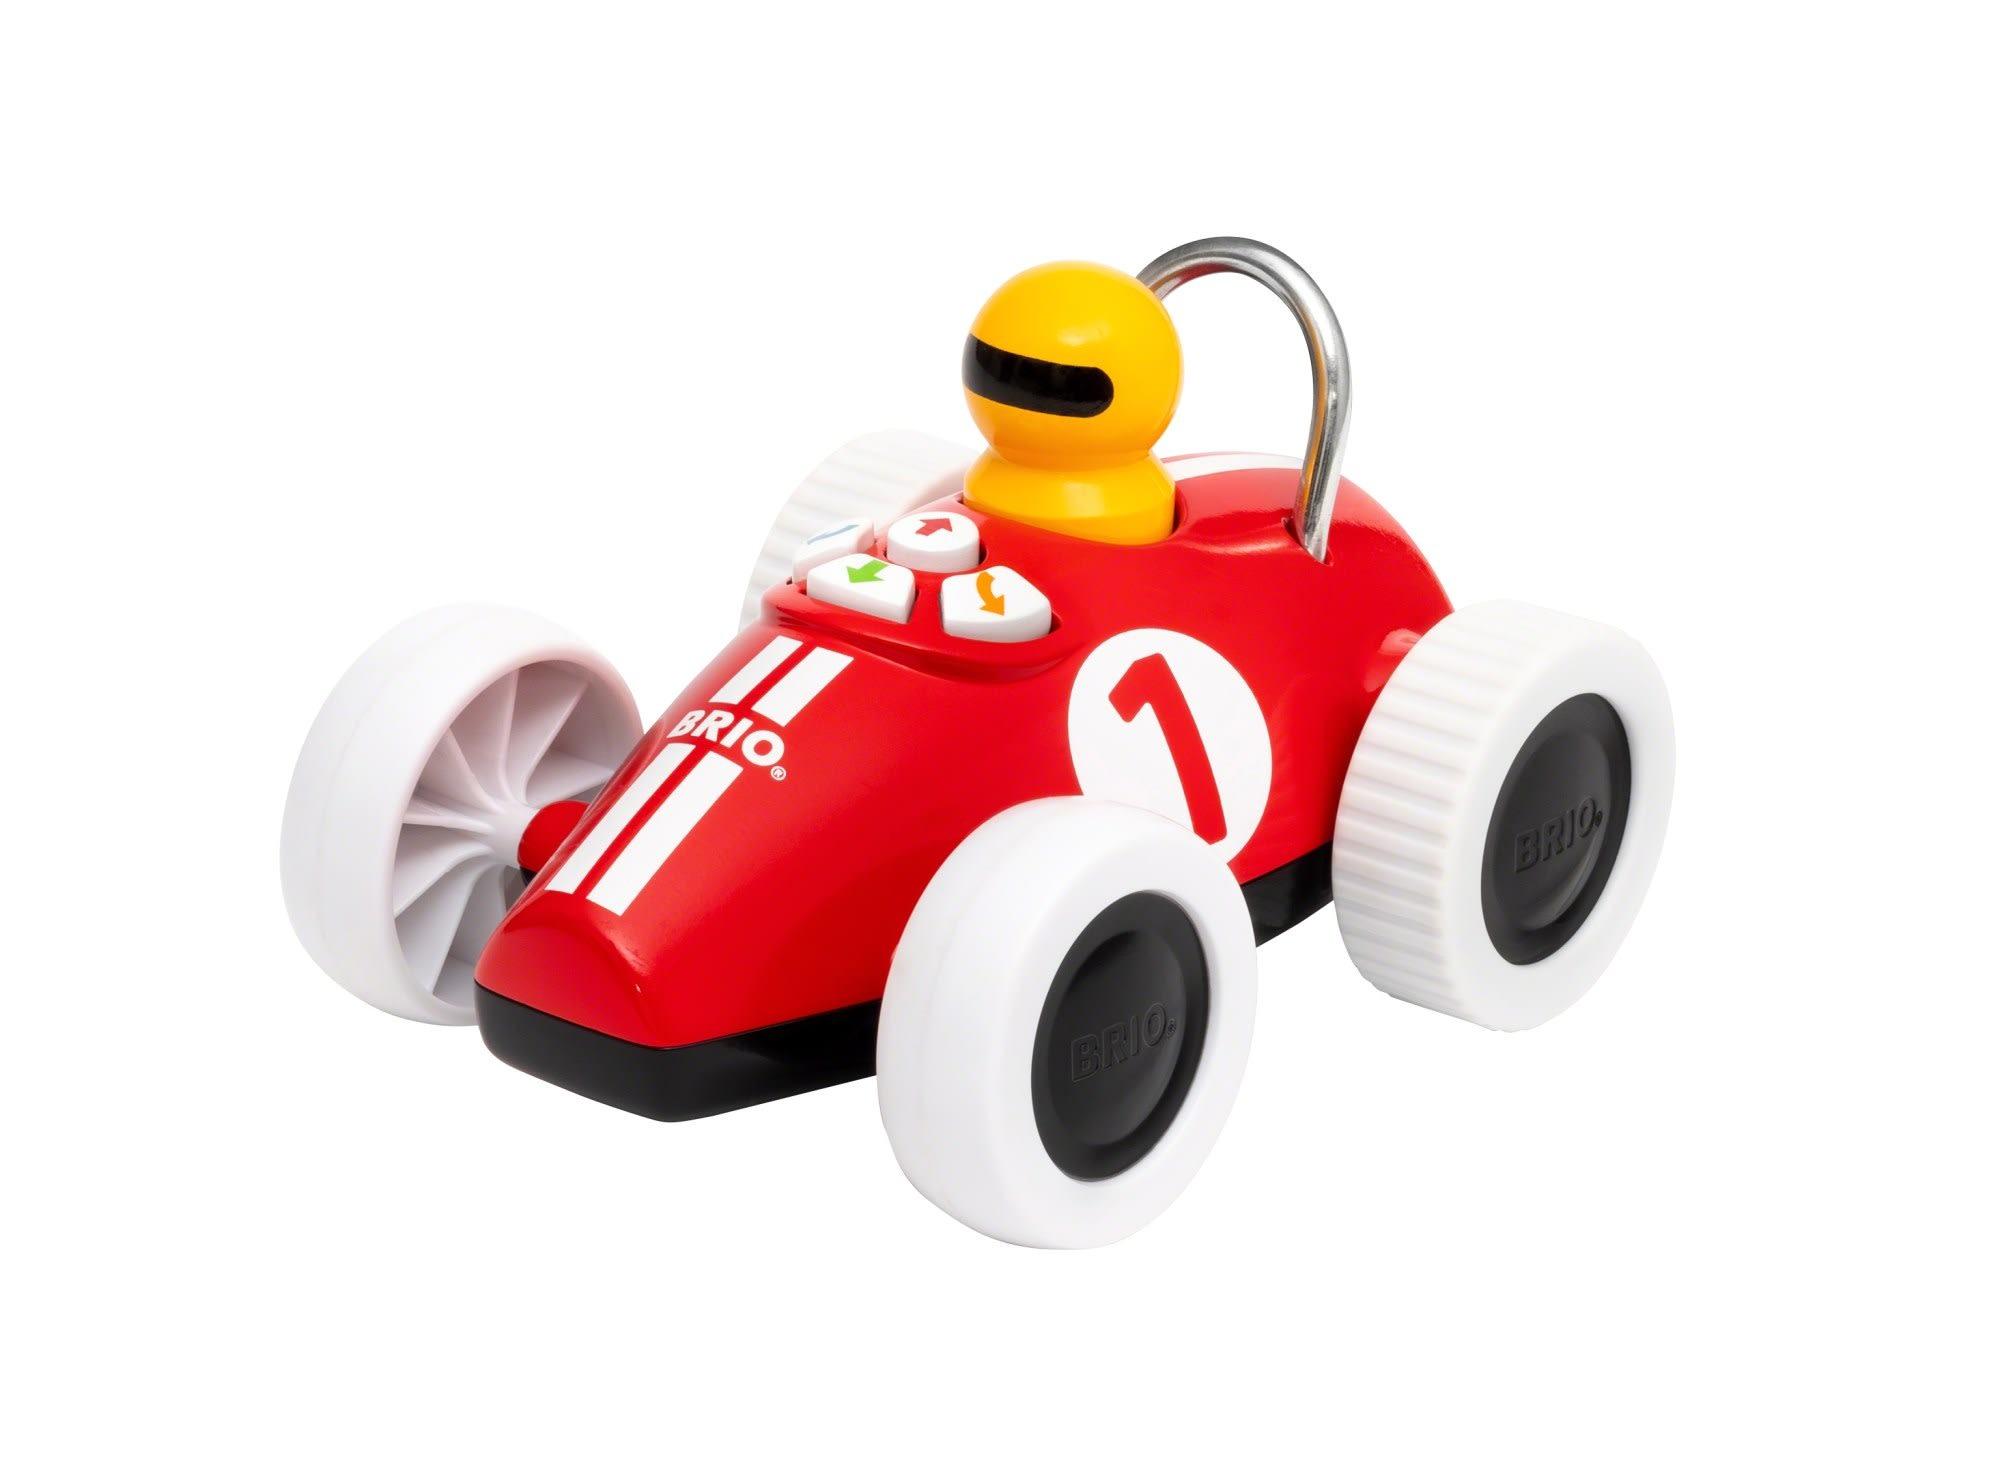 Leg og lær action racerbil